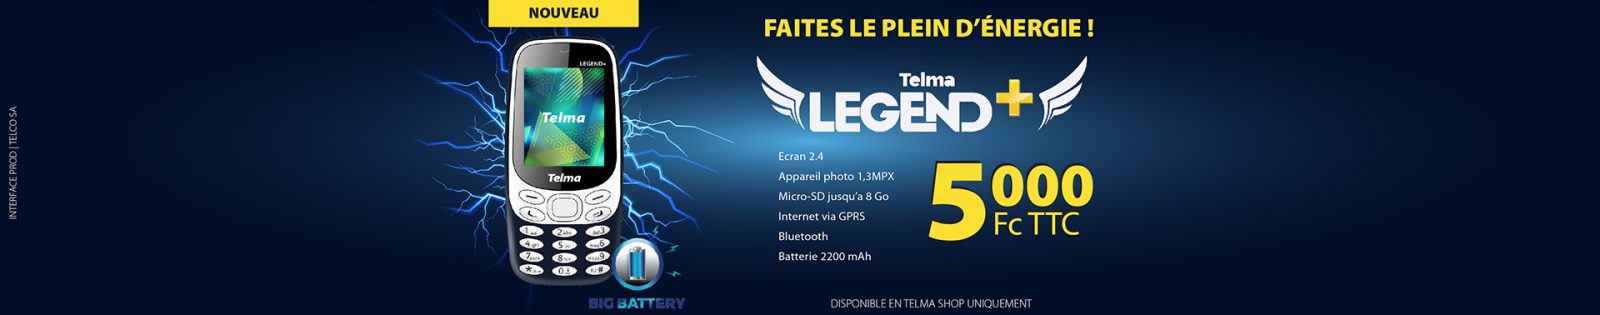 Telma legend+